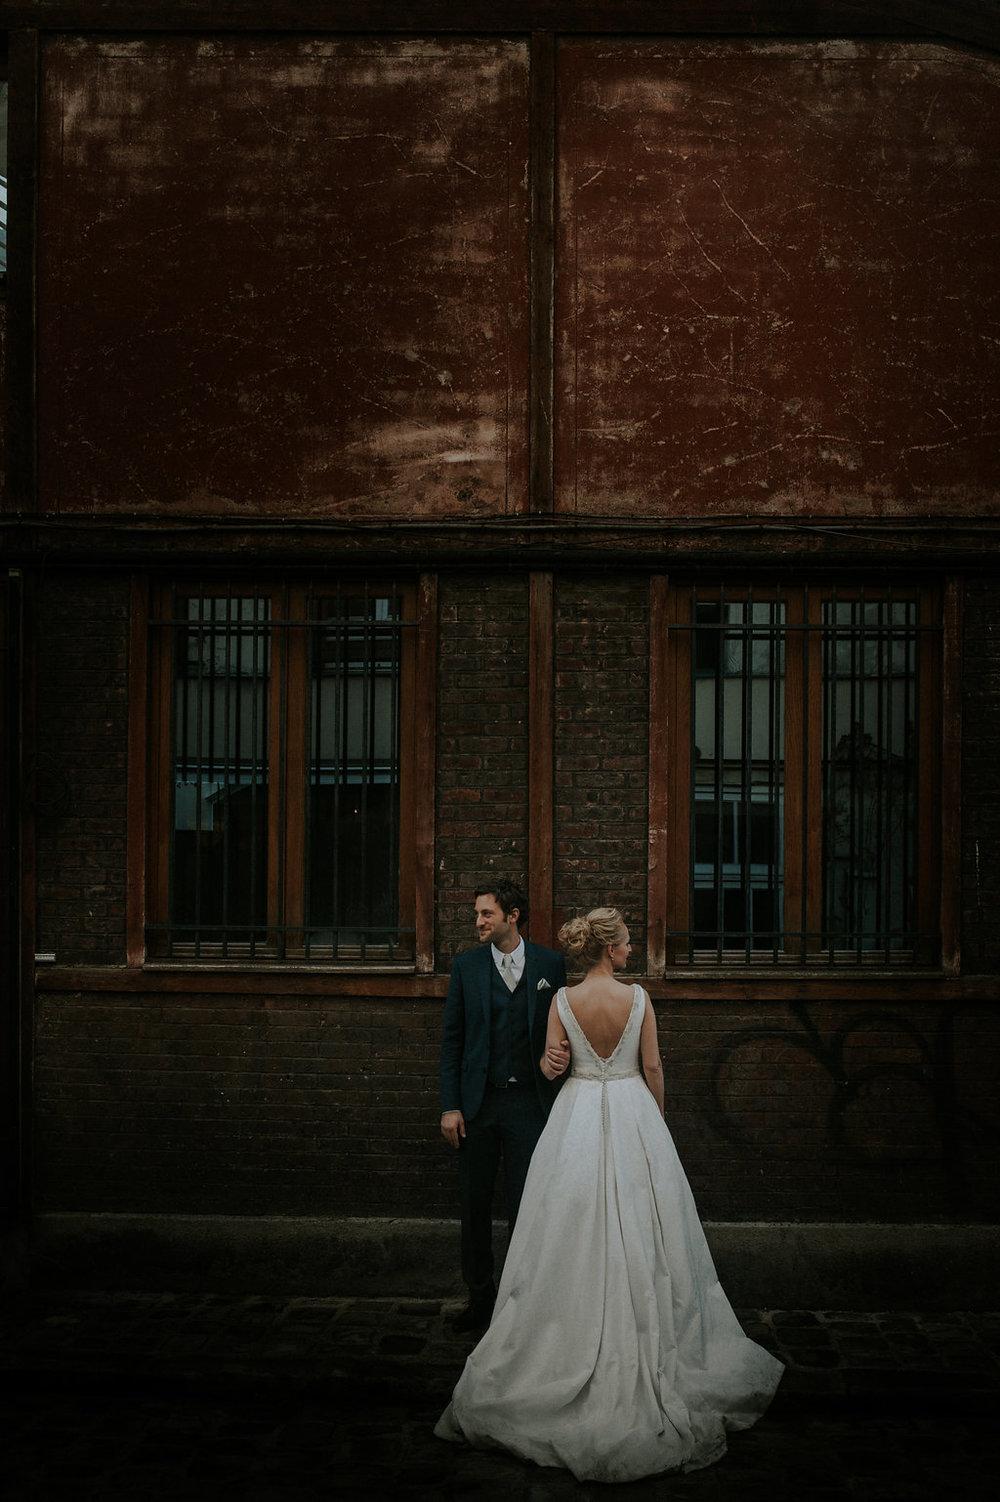 photographe_mariage_paris (2).jpg